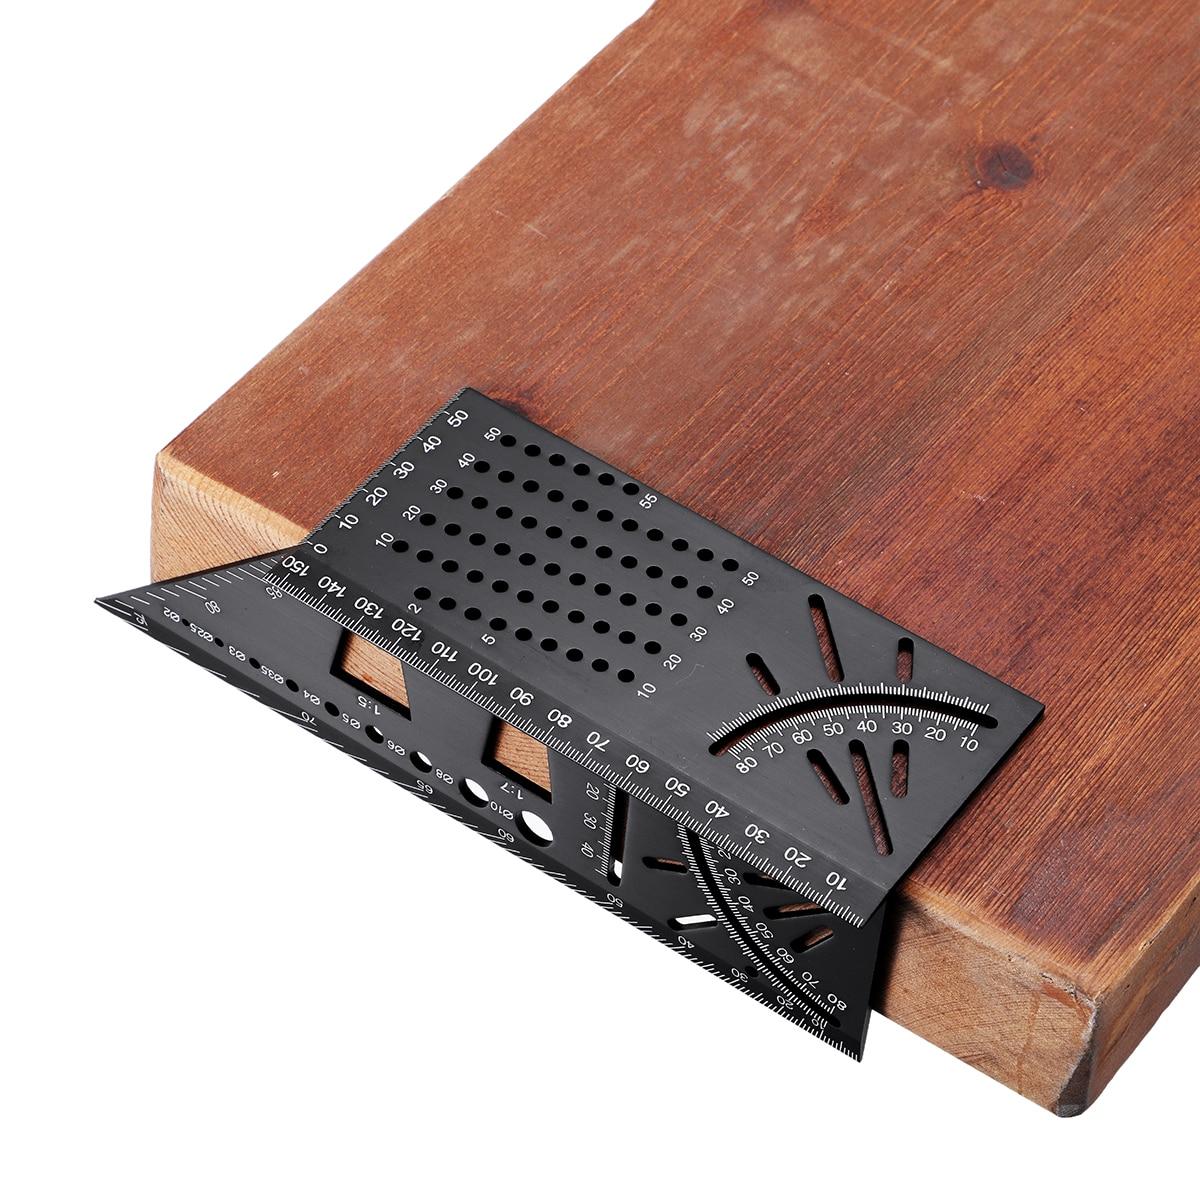 Aluminium Legierung 3D Gehrung Winkel Mess Platz 45 90 Grad Winkel Lineal Satzzeichen Kennzeichnung Gauge Framing Winkelmesser Holzbearbeitung